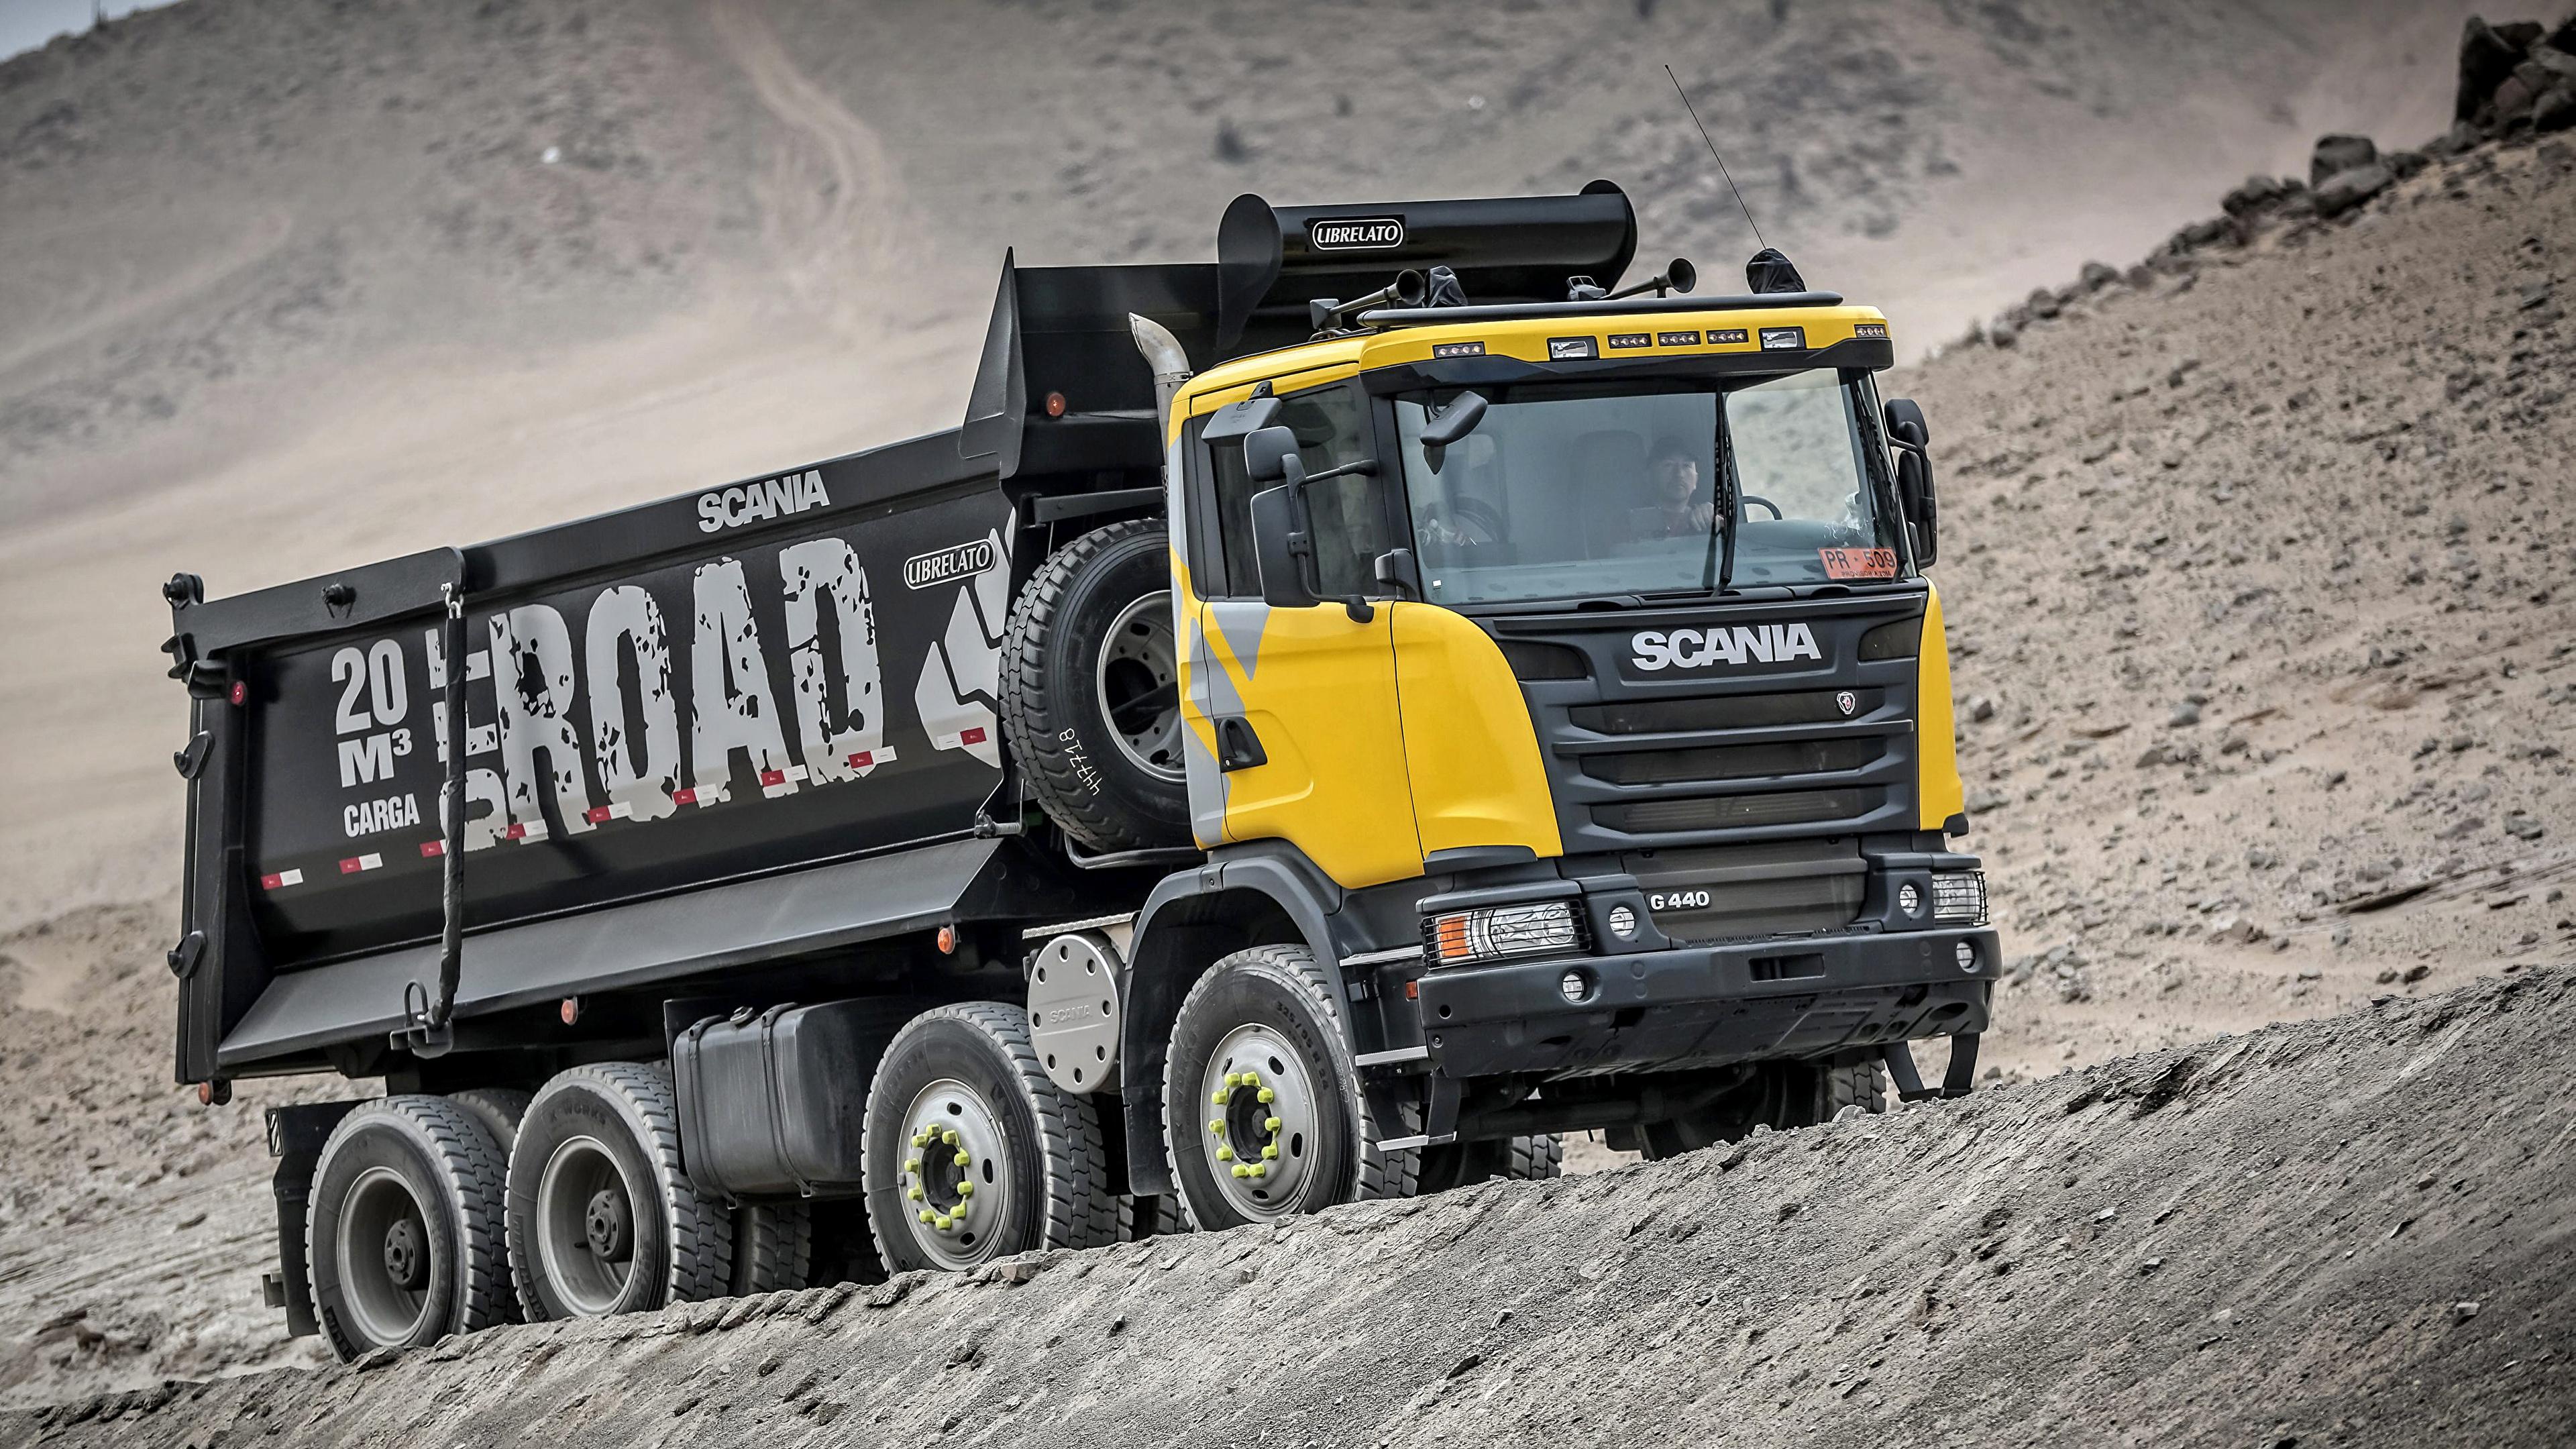 Photo lorry Scania 8x4, G440, 2013 Cars 3840x2160 Trucks auto automobile